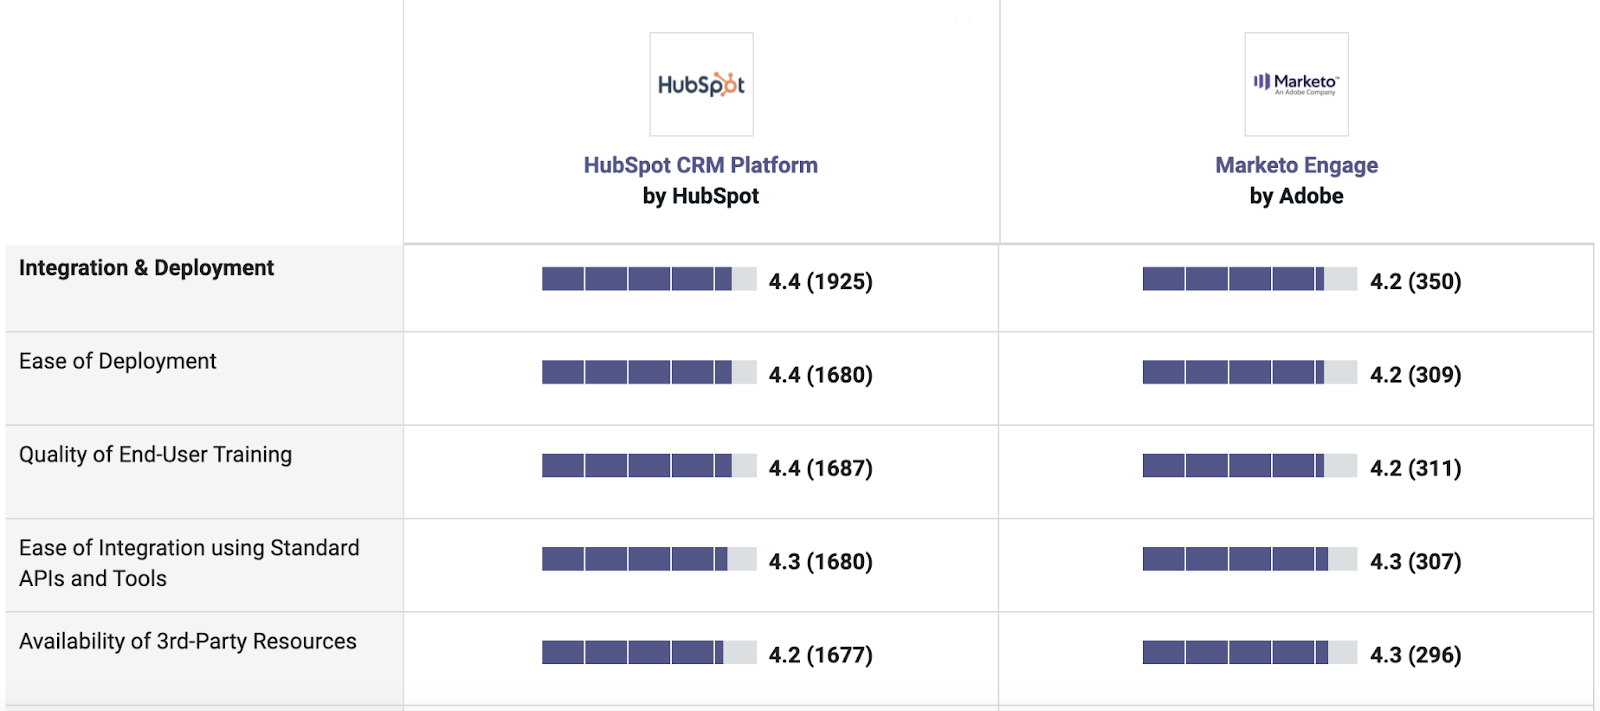 Comparison chart between HubSpot and Marketo